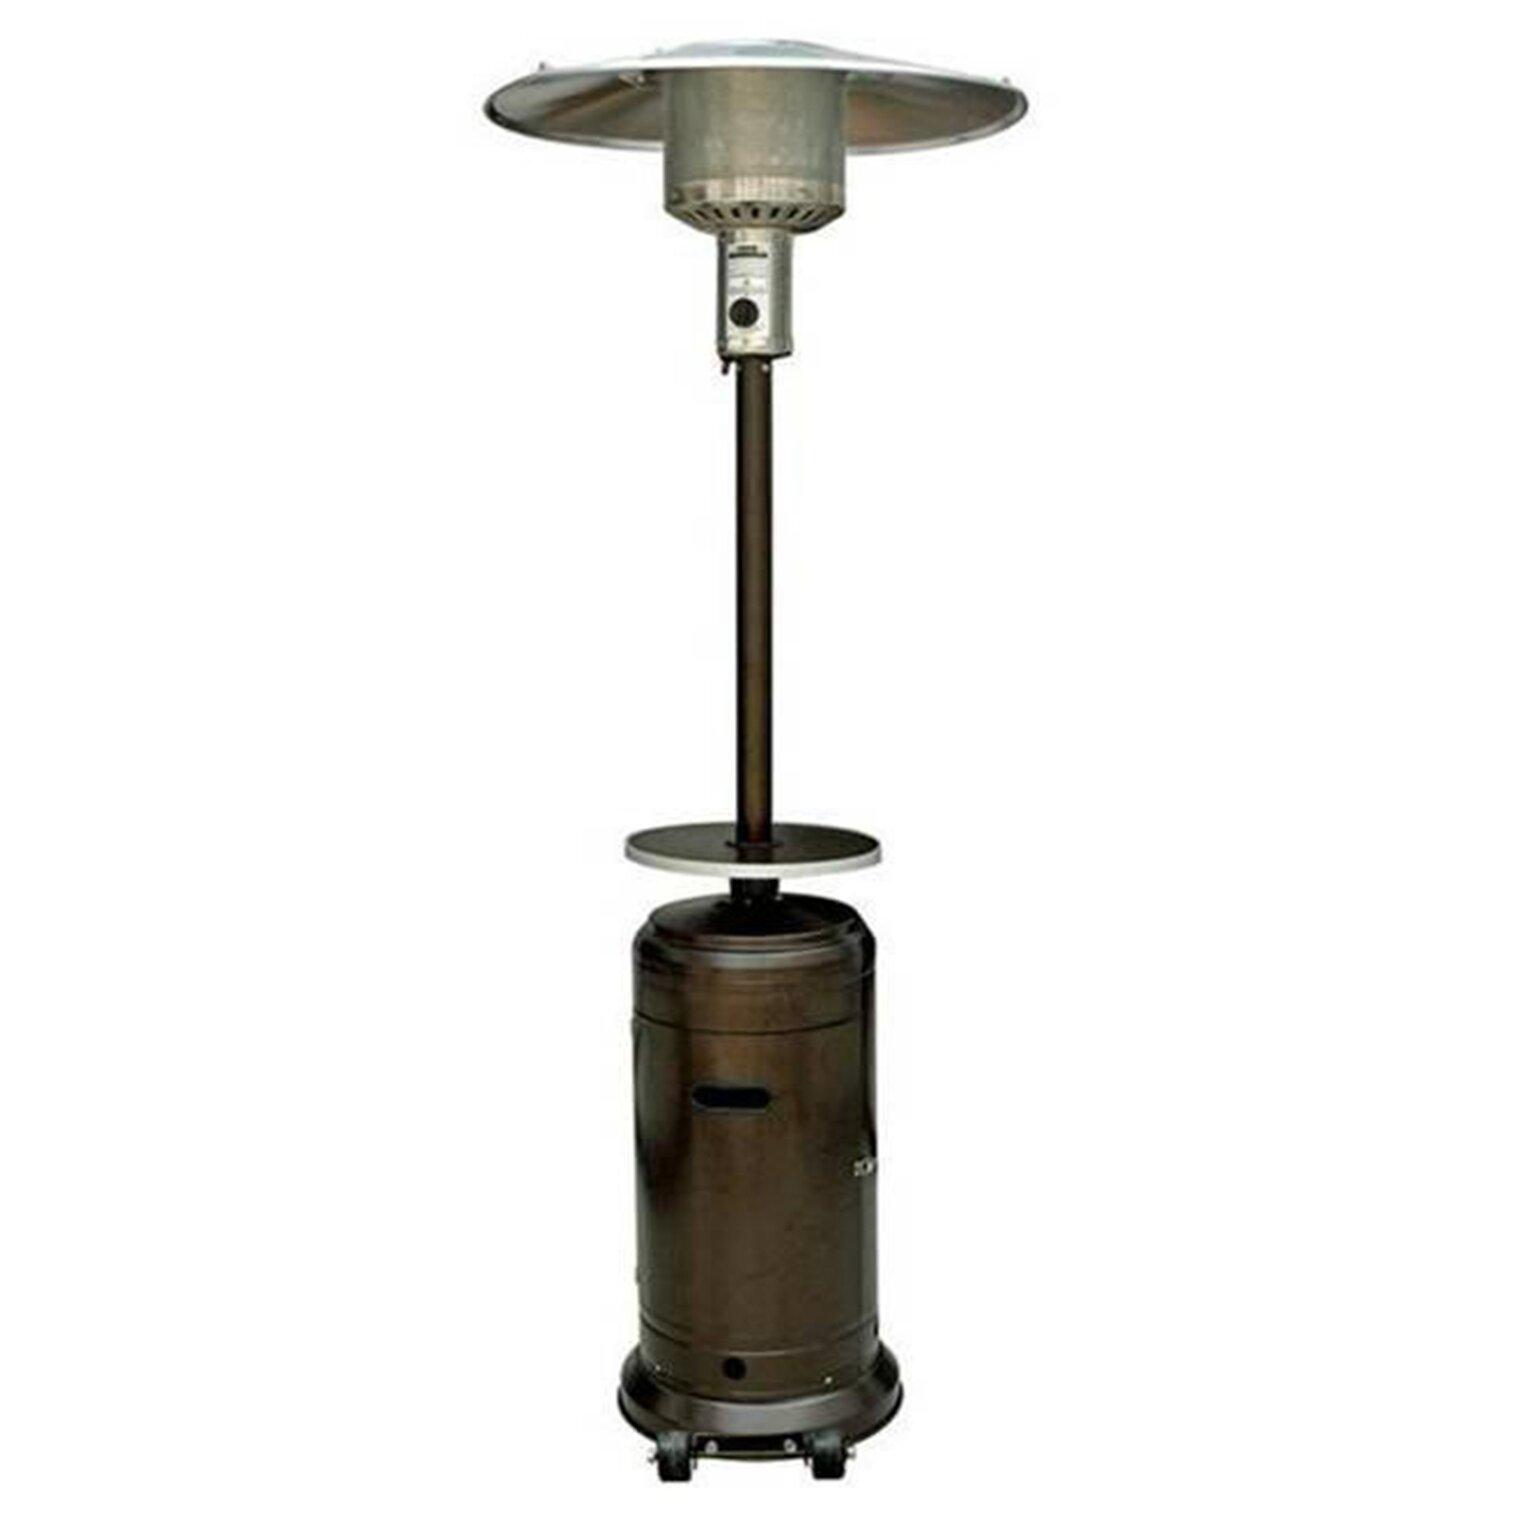 Outdoor outdoor heating propane patio heaters buyers choice sku